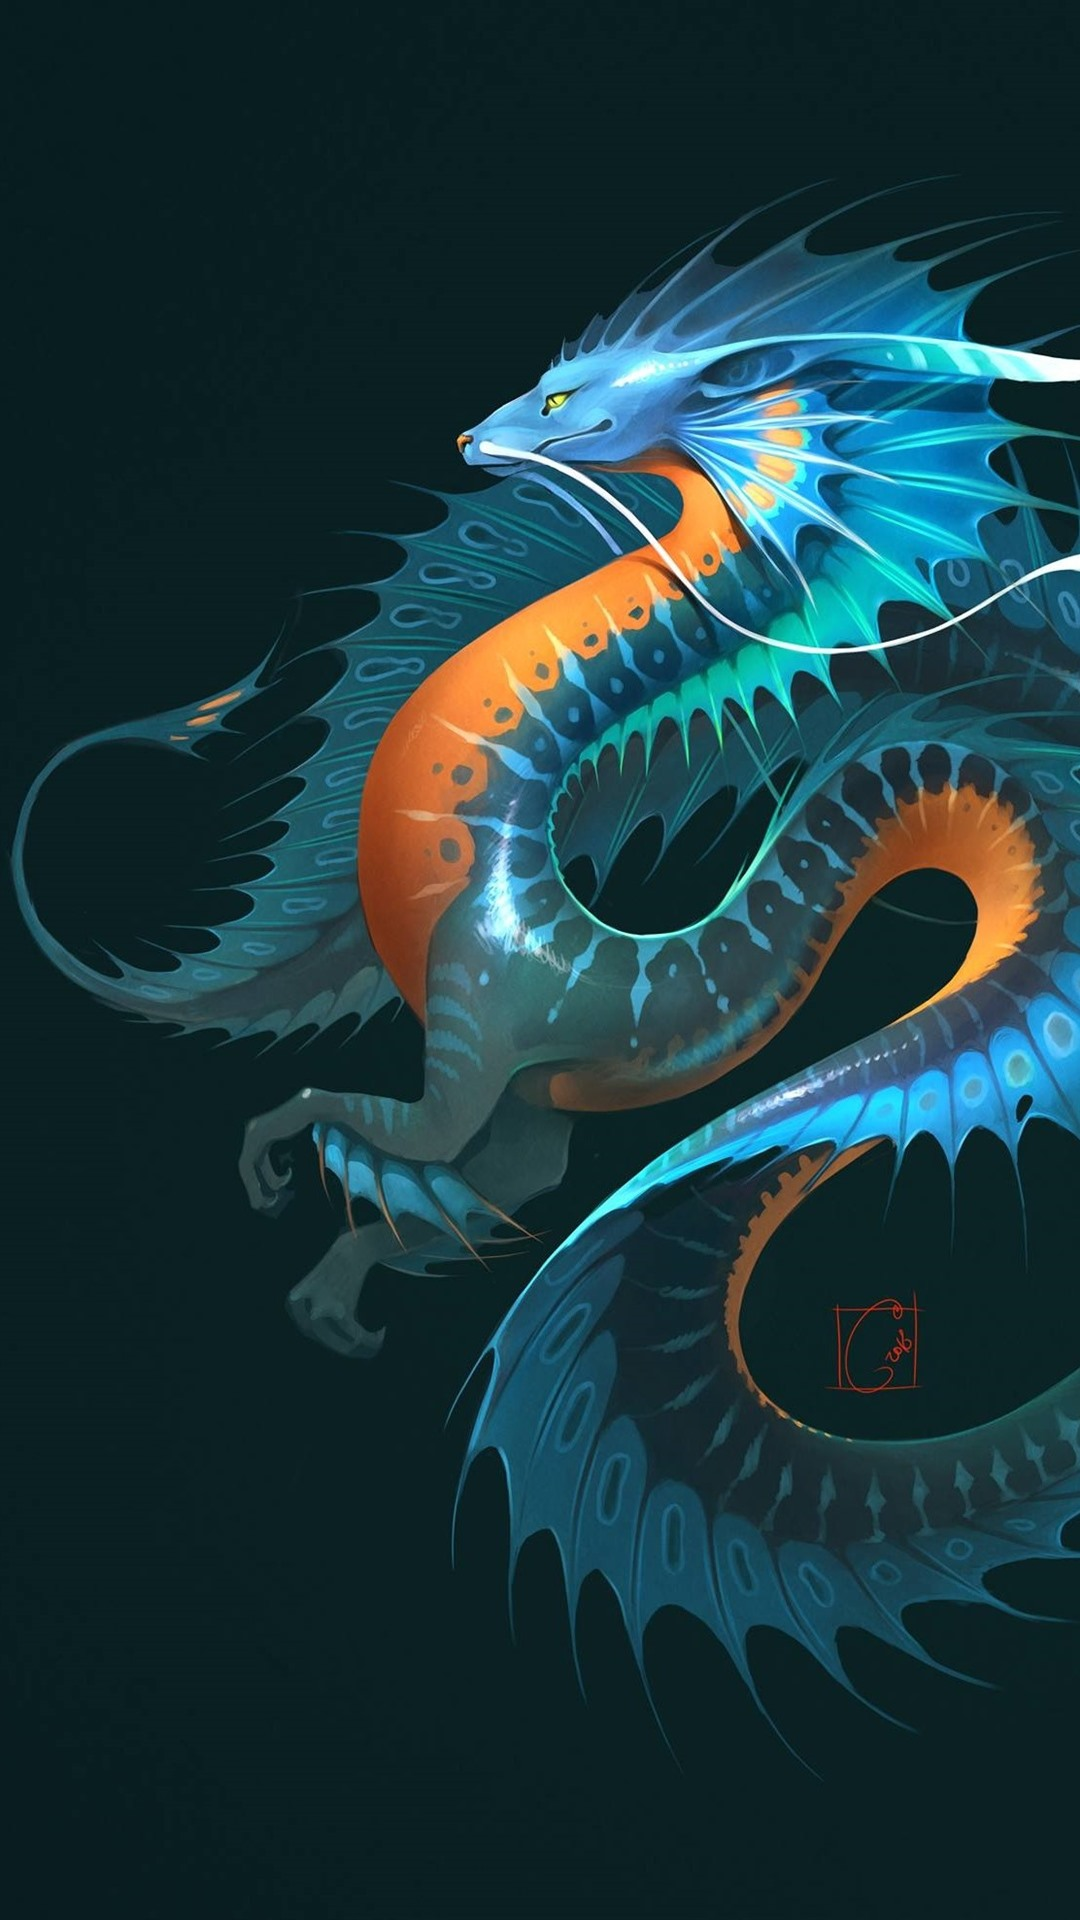 Dragon Fantasy Animal 1080x1920 Iphone 8 7 6 6s Plus